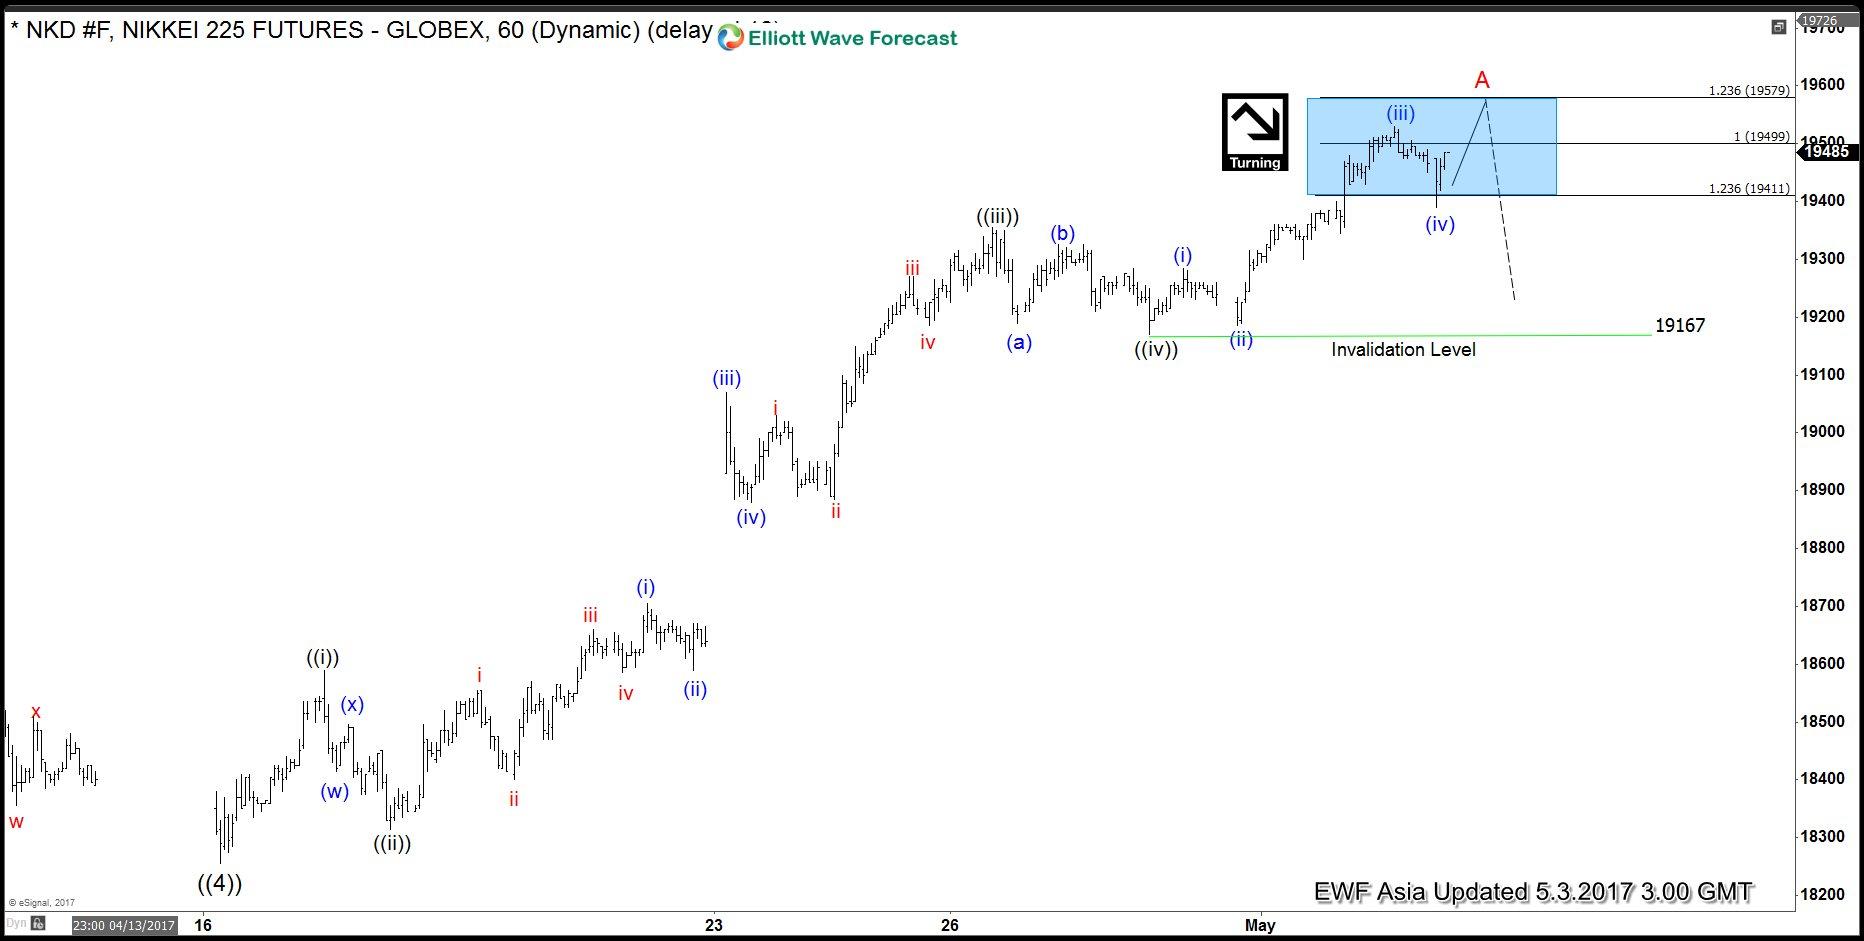 Nikkei Elliott Wave View: Ending impulsive 5 waves